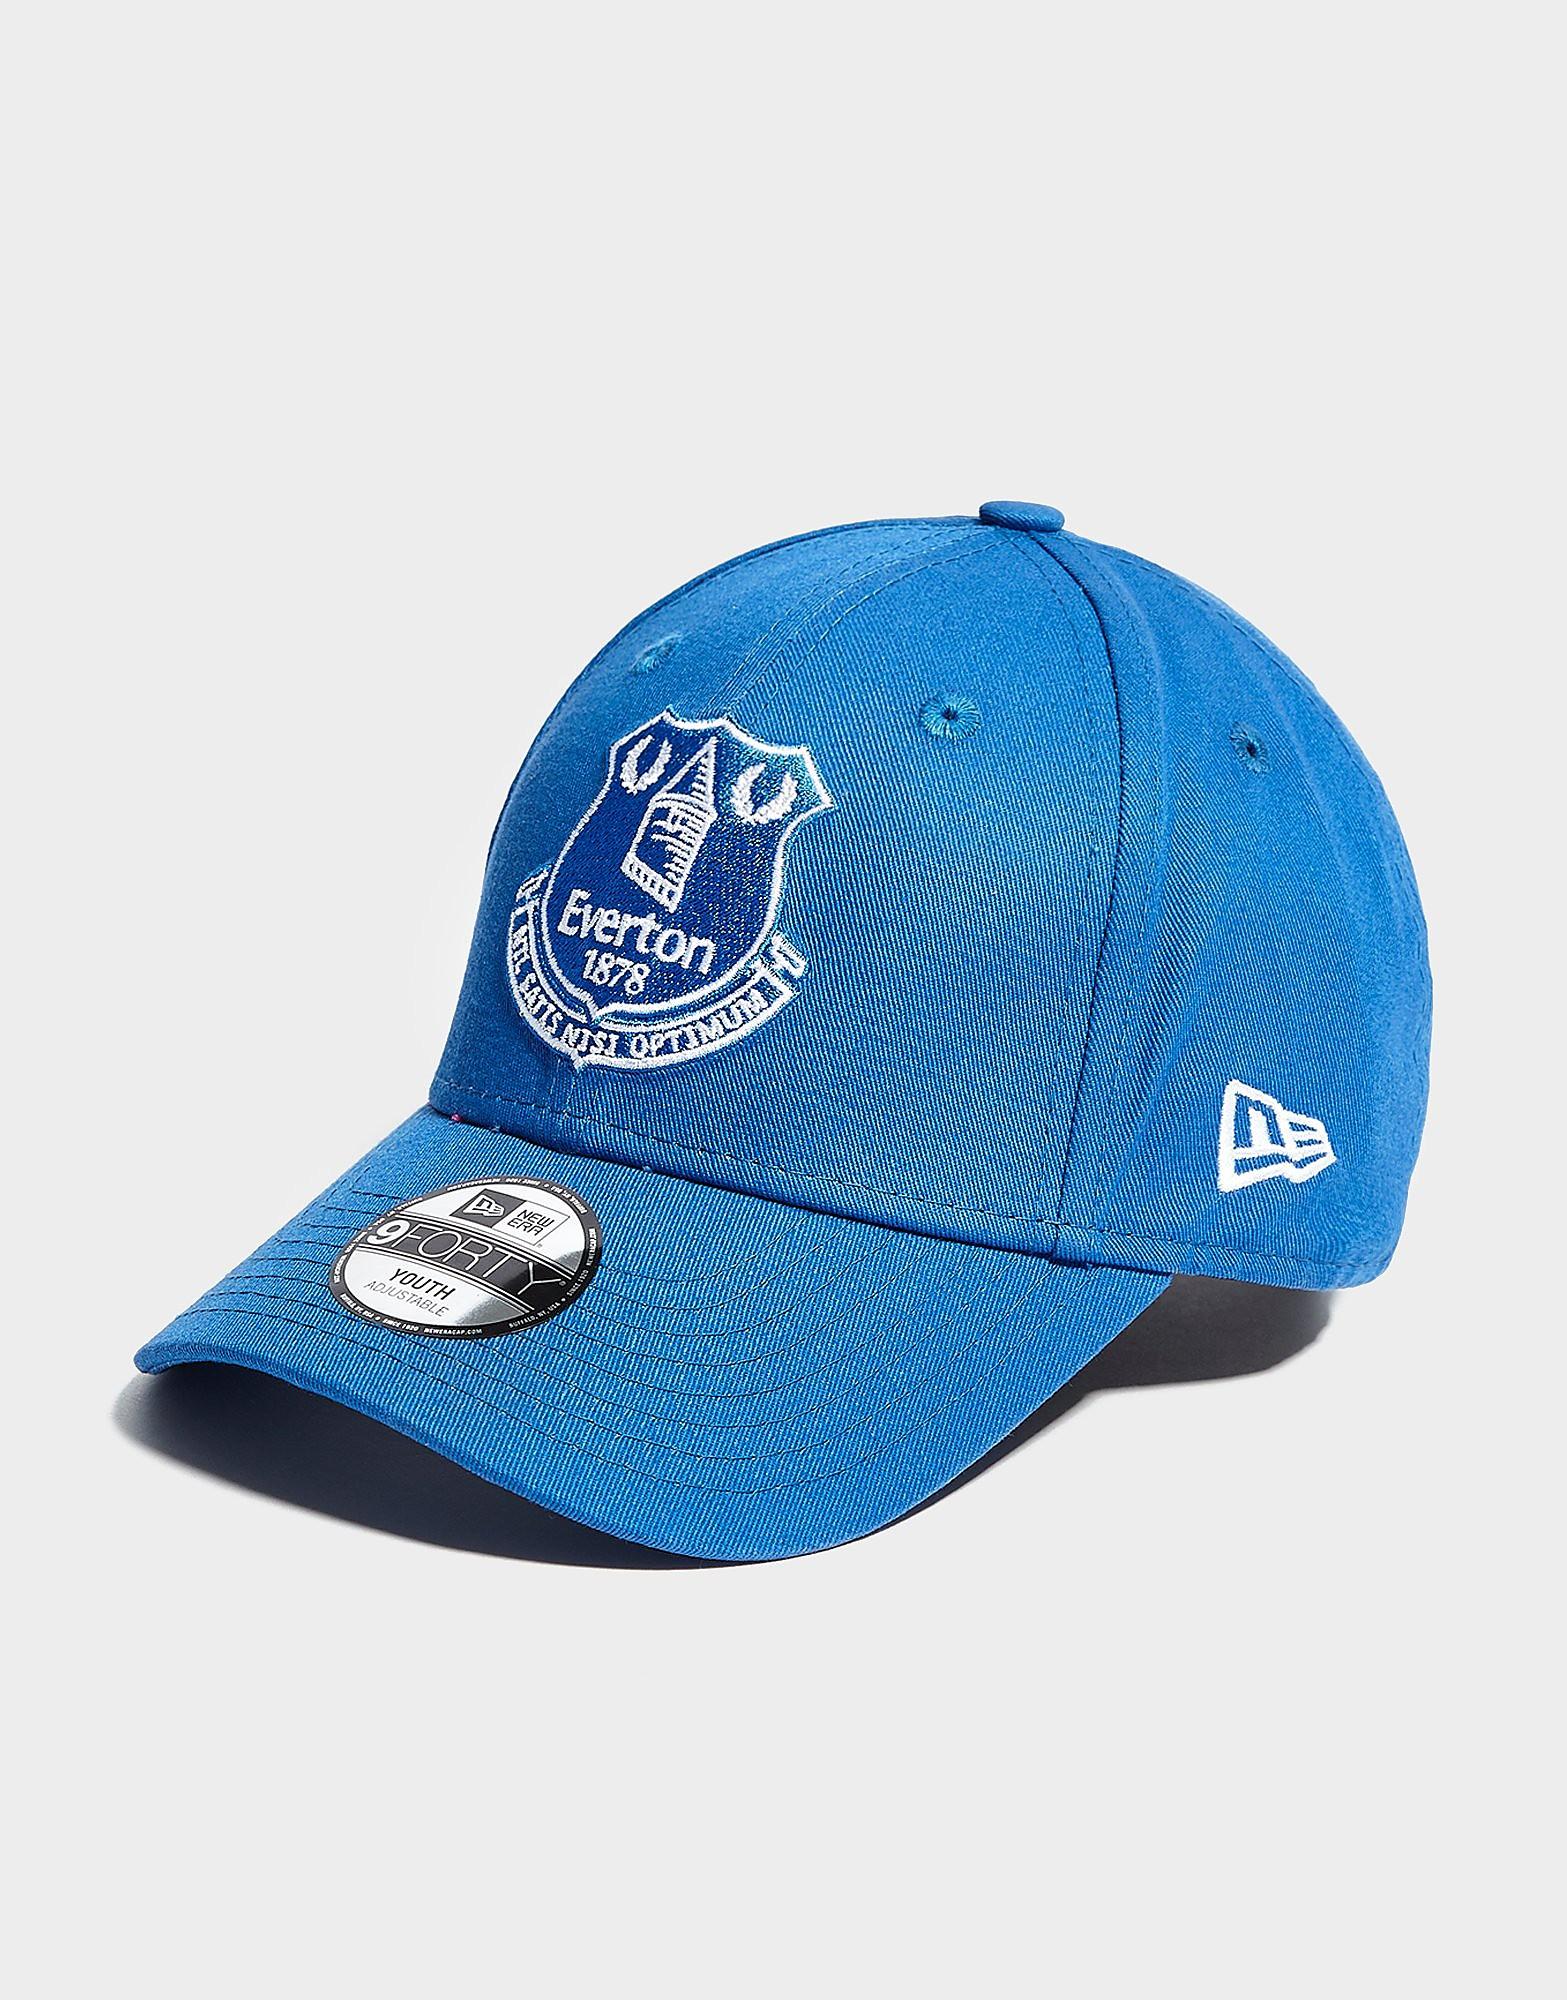 New Era Everton FC 9FORTY Cap - Blauw - Kind